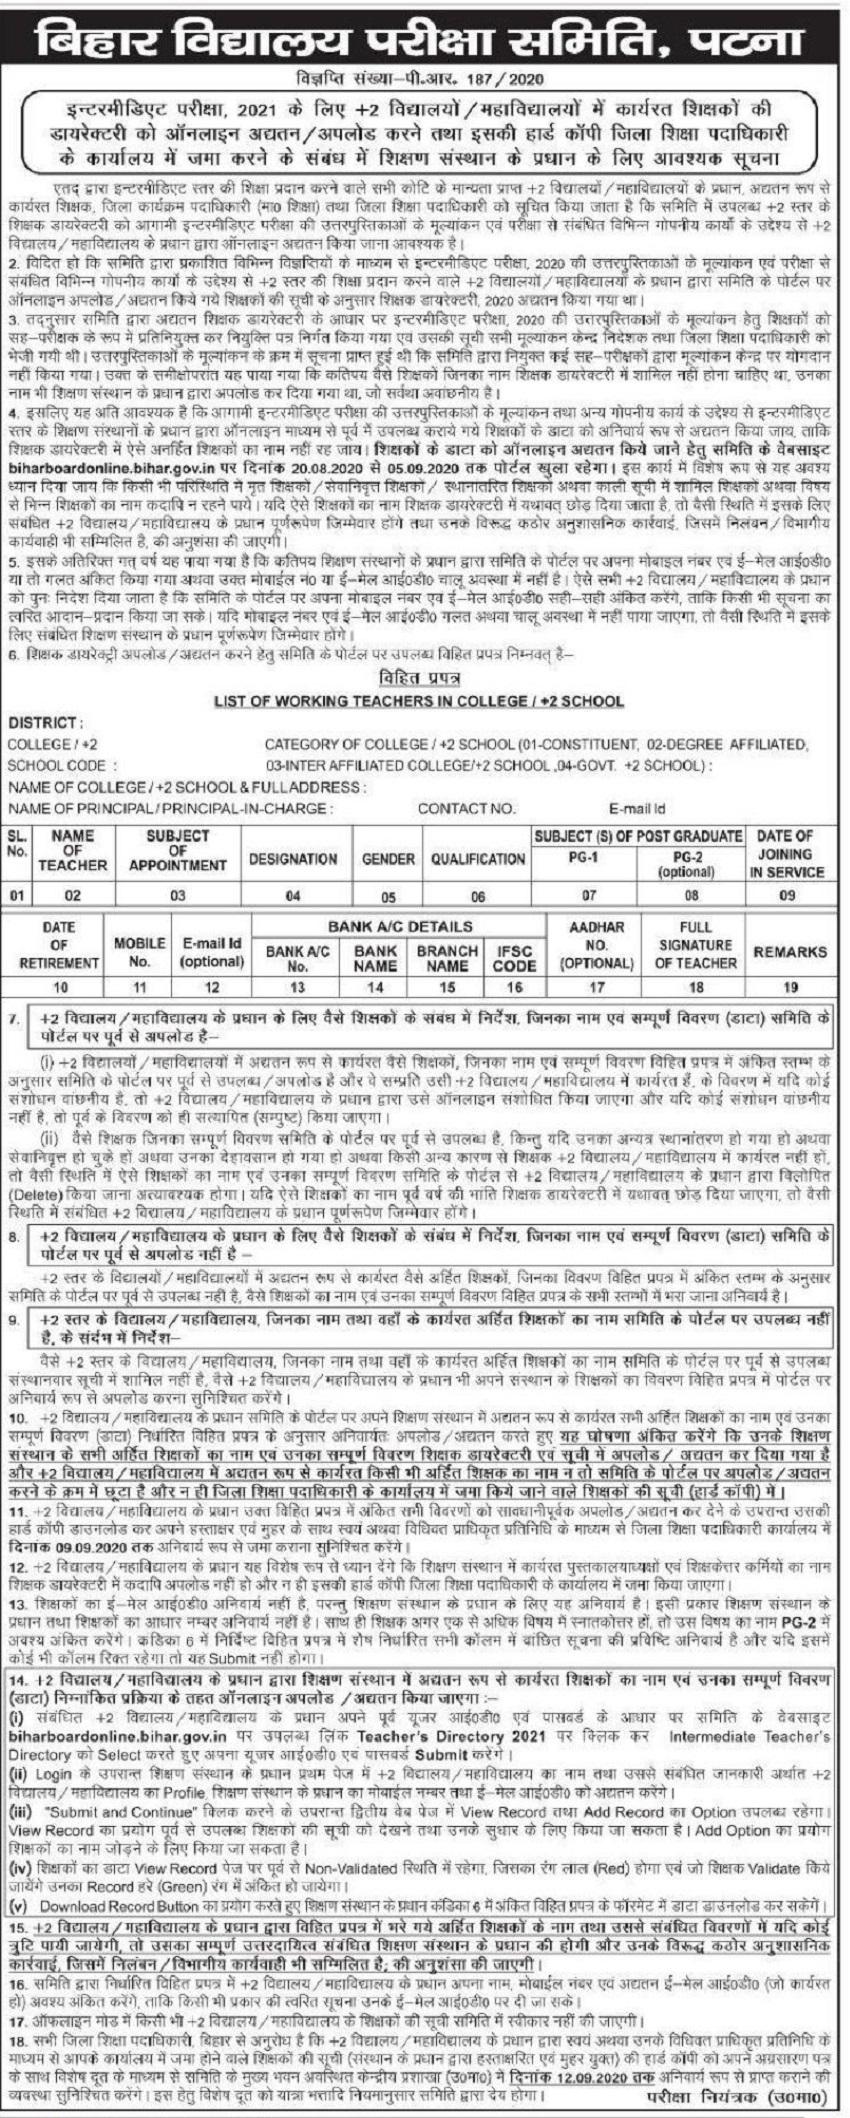 bihar board inter teacher directory update 2021